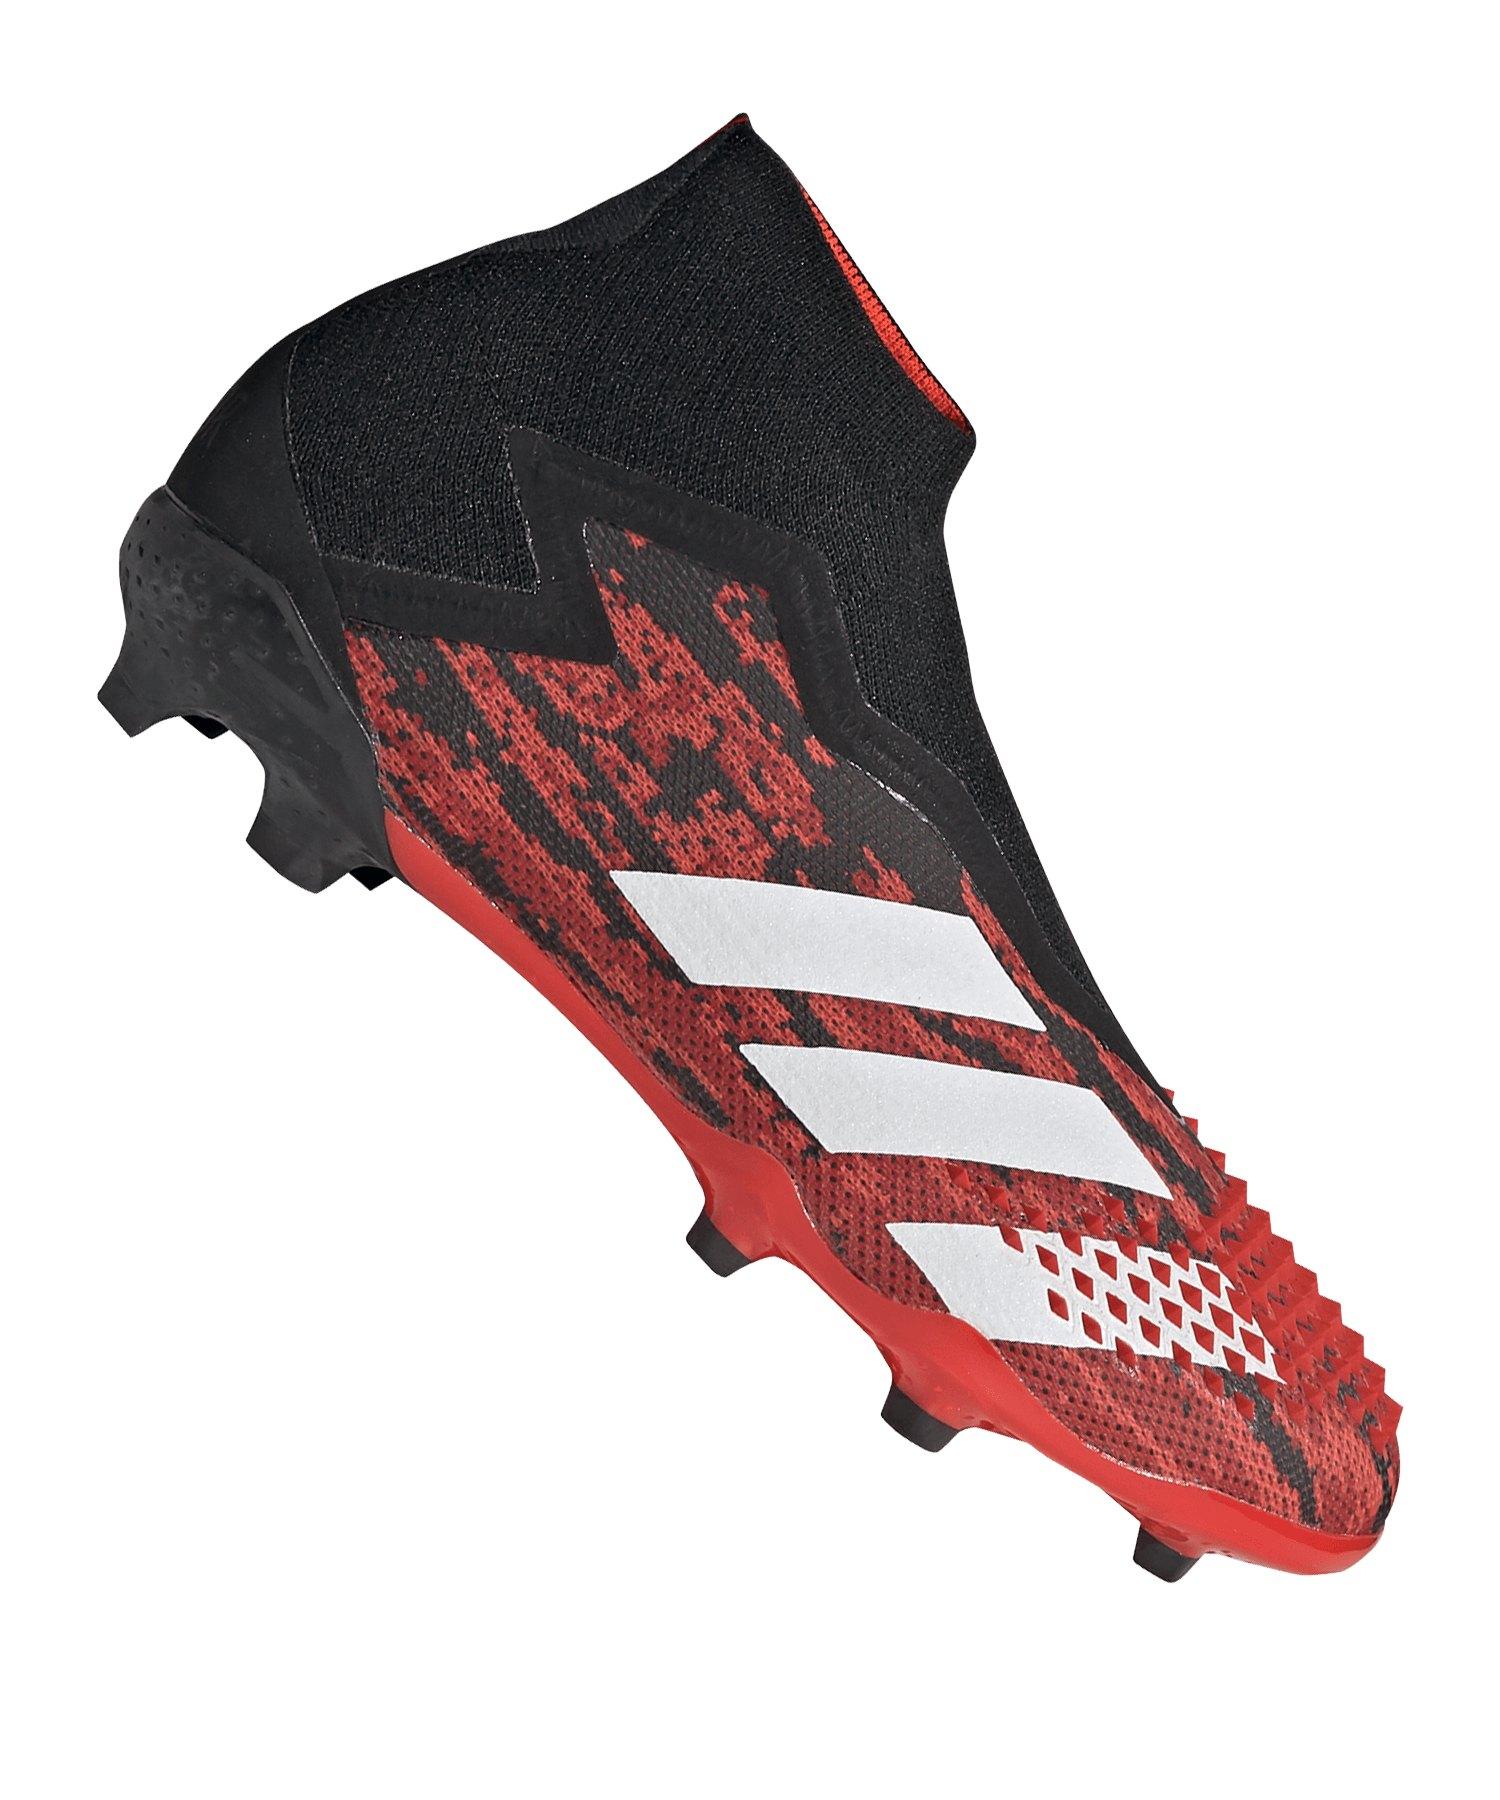 adidas Predator 20+ FG J Kids Schwarz Rot - schwarz